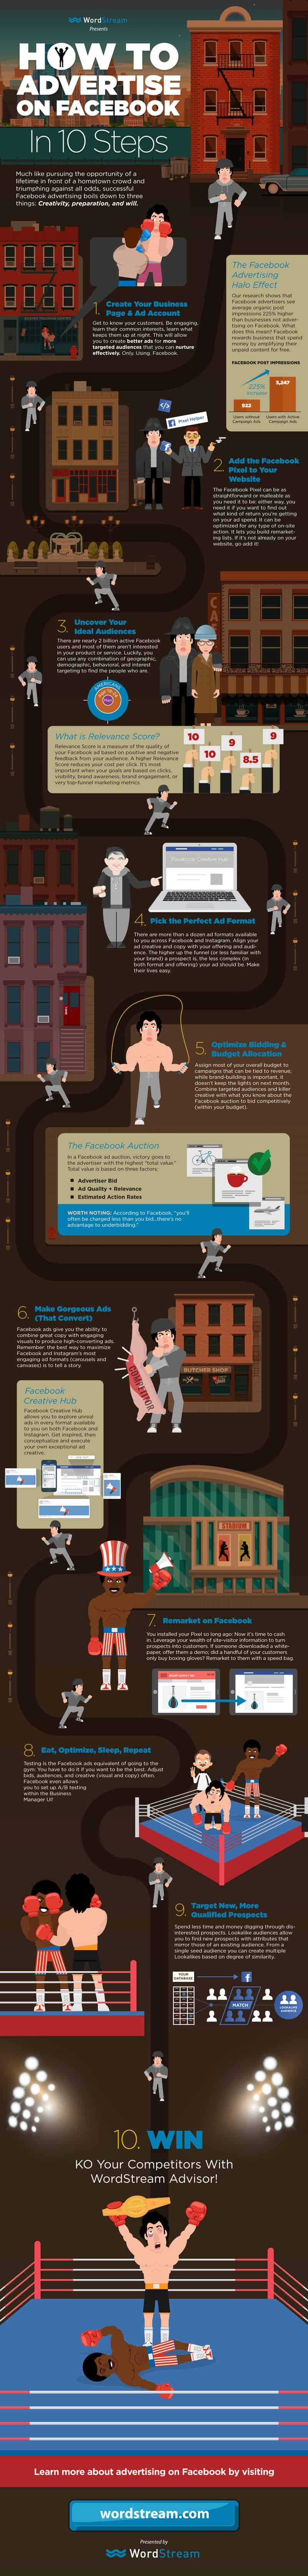 Infographie: conquérir Facebook en 10 étapes